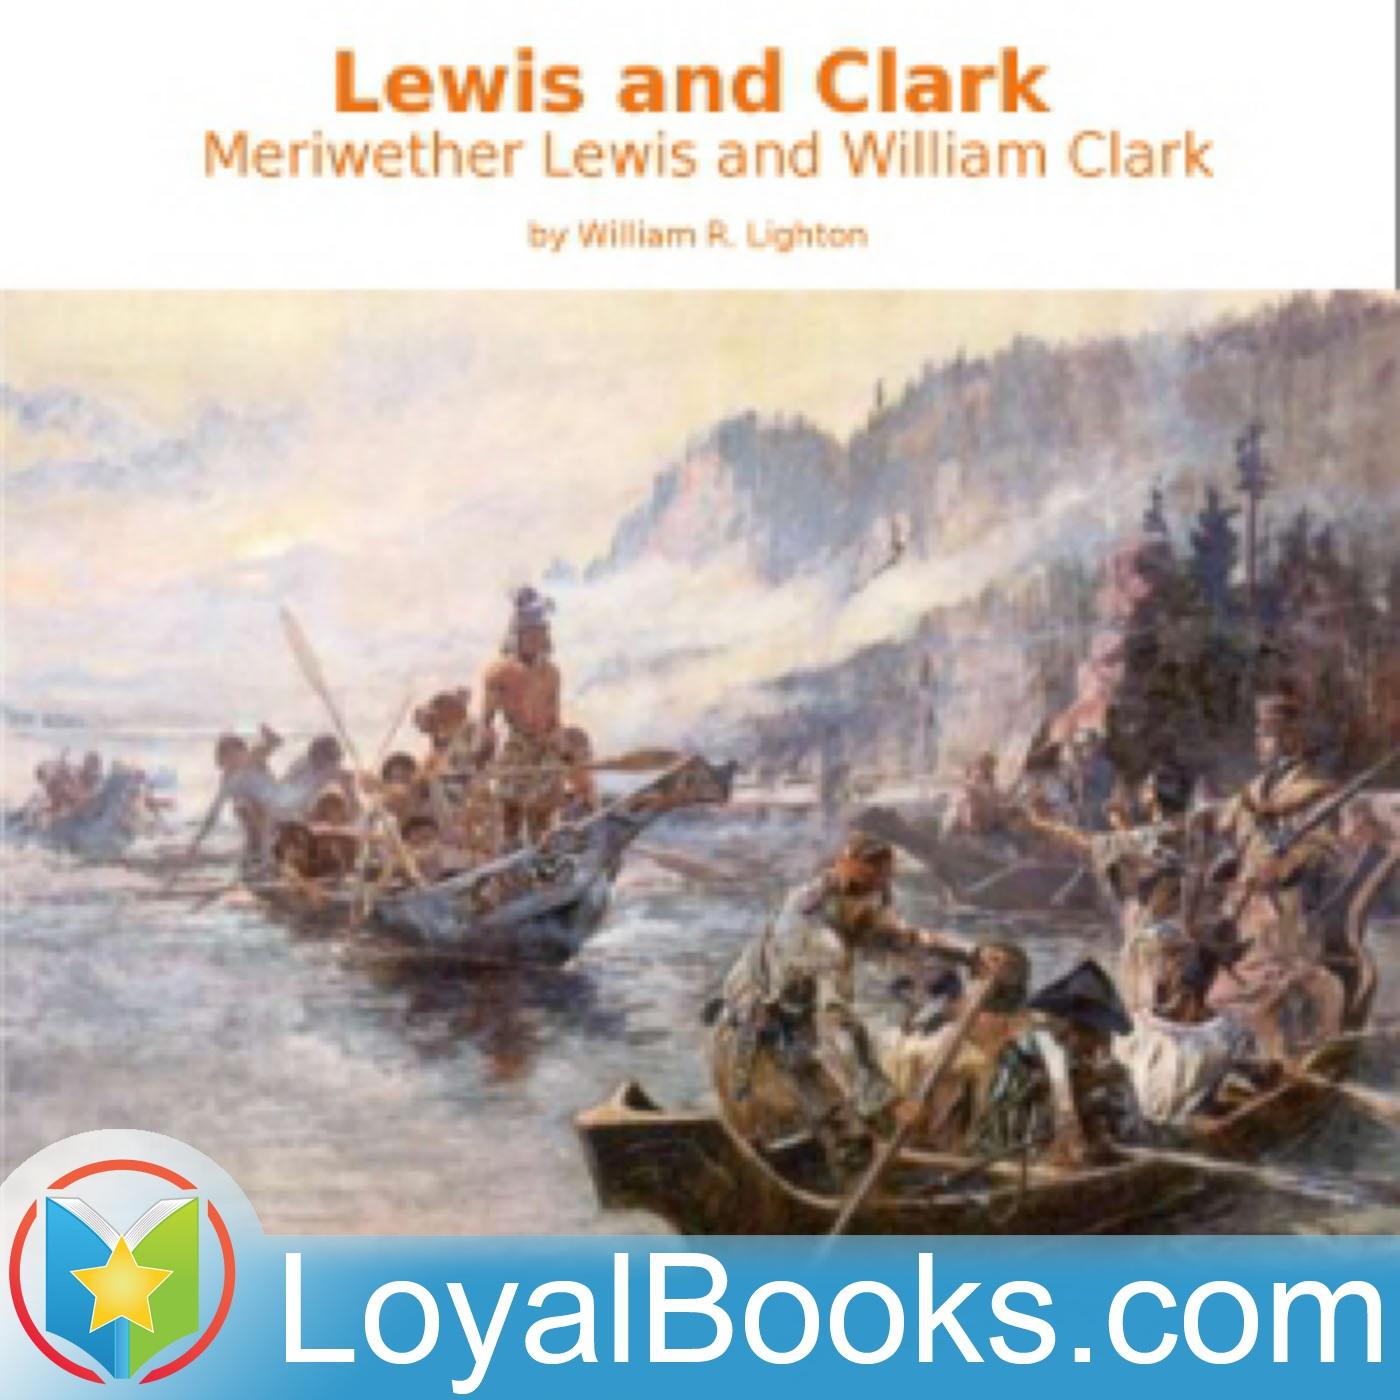 Lewis and Clark: Meriwether Lewis and William Clark by William R. Lighton  